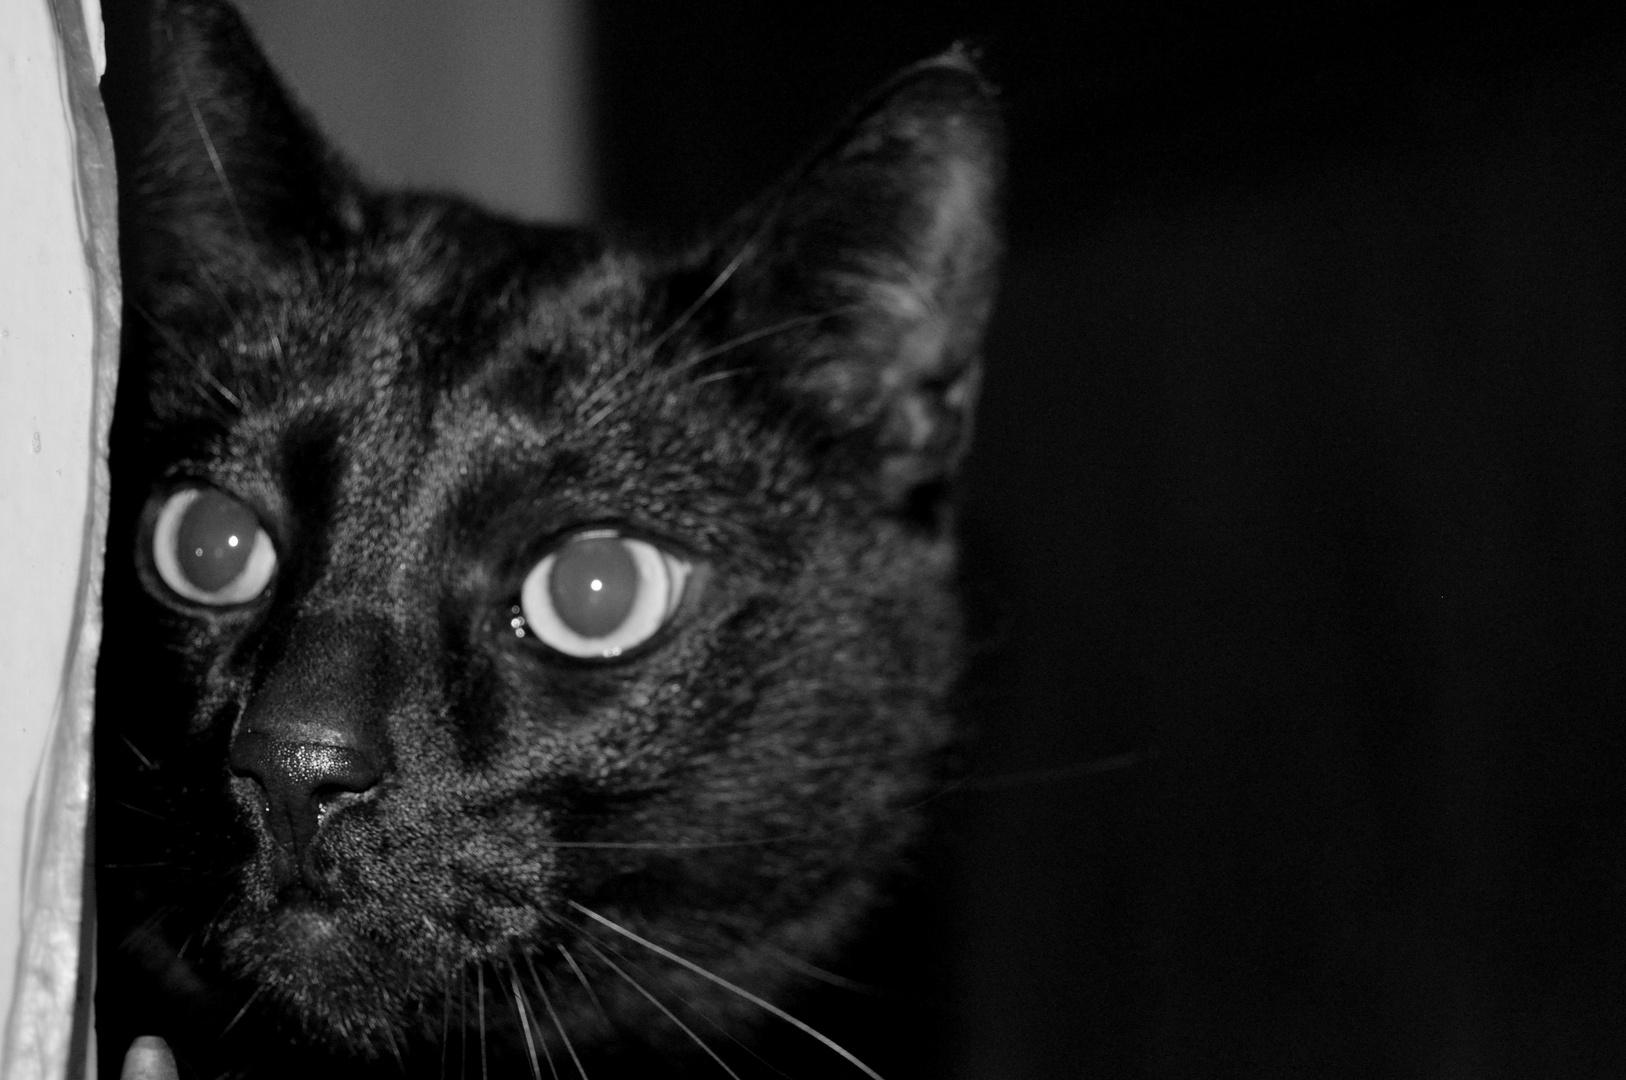 Pouyou le chat